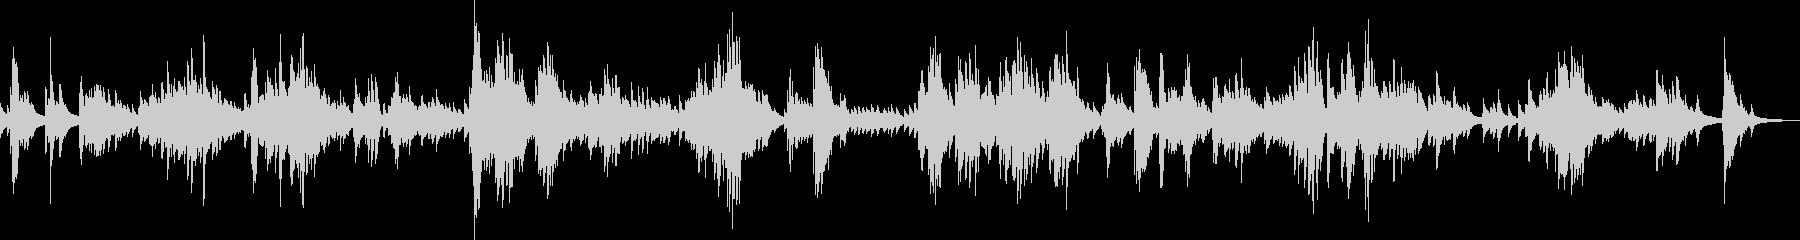 A piano piece that trembles lonely's unreproduced waveform